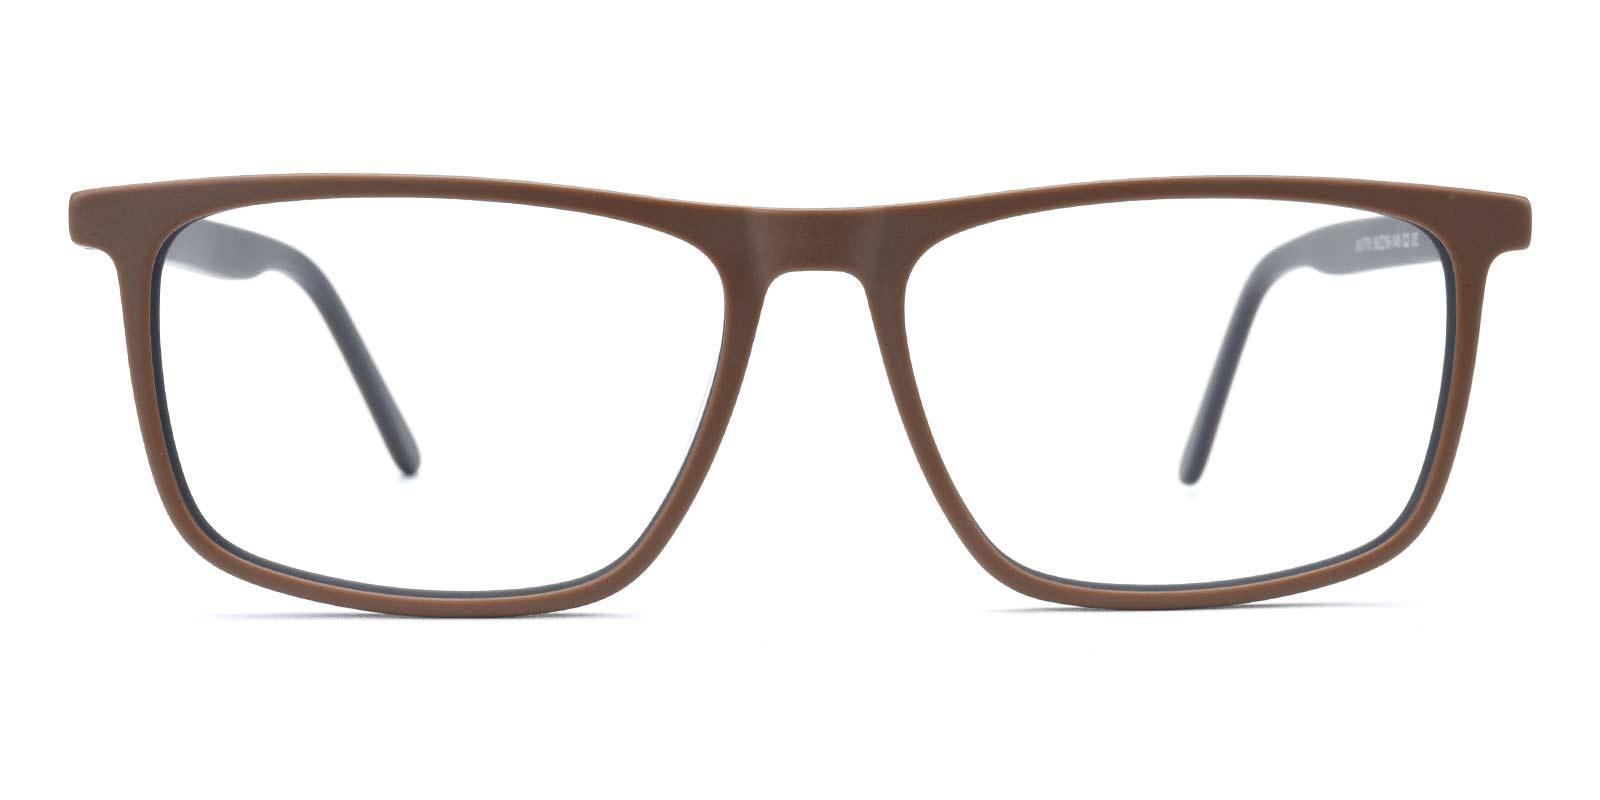 Barbar-Brown-Rectangle-Acetate-Eyeglasses-additional2